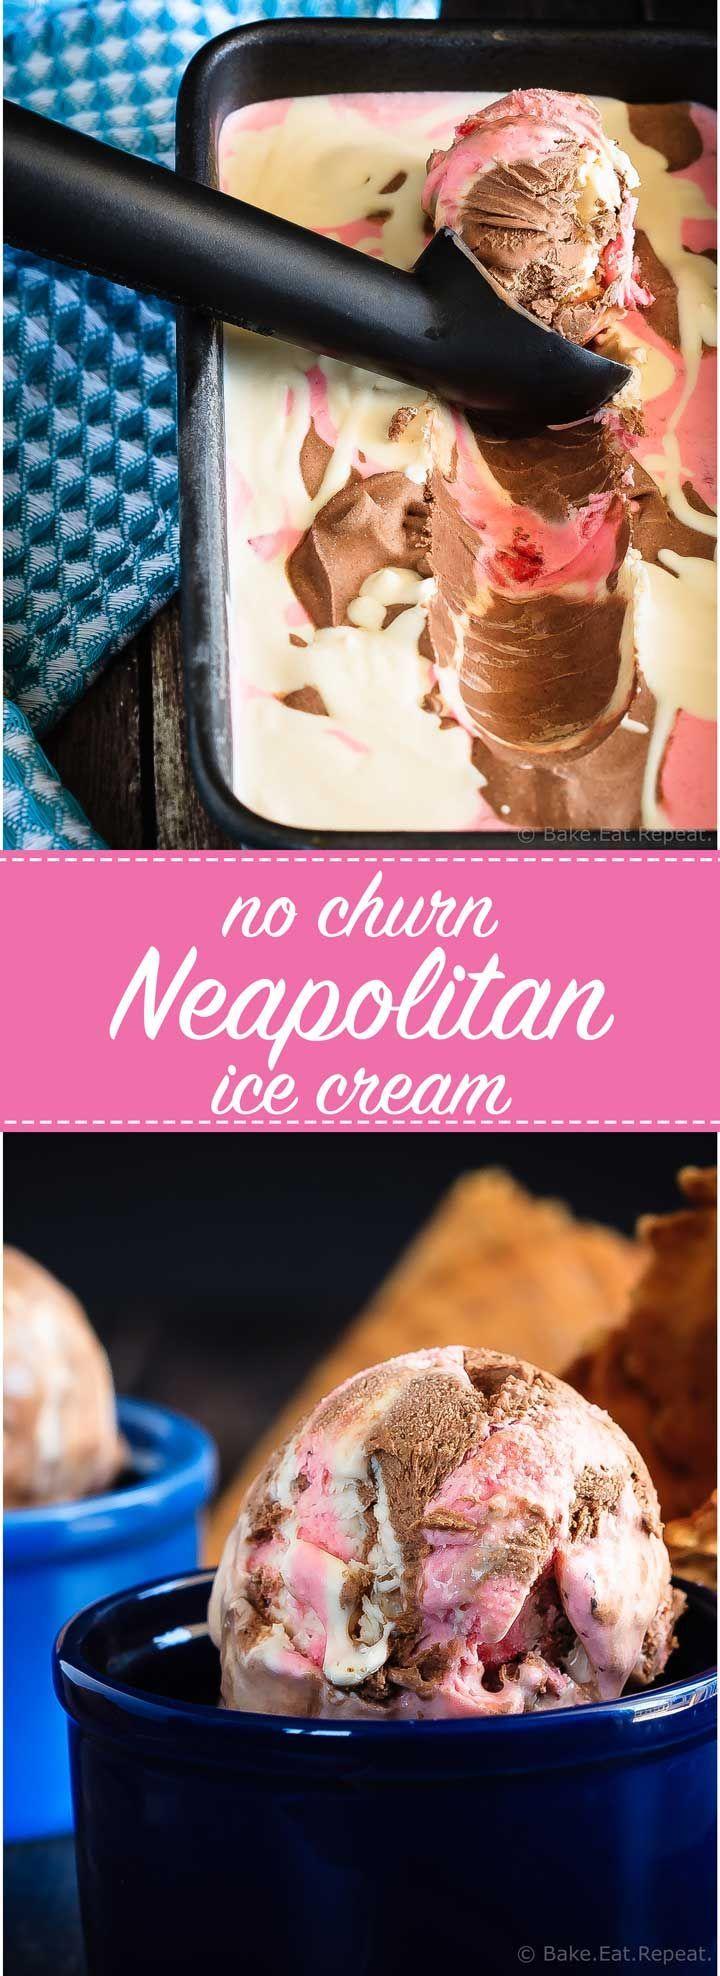 No Churn Neapolitan Ice Cream - Easy, no churn Neapolitan ice cream - made with Eagle Brand Sweetened Condensed Milk, this mix of vanilla, chocolate and strawberry ice cream is perfectly creamy!